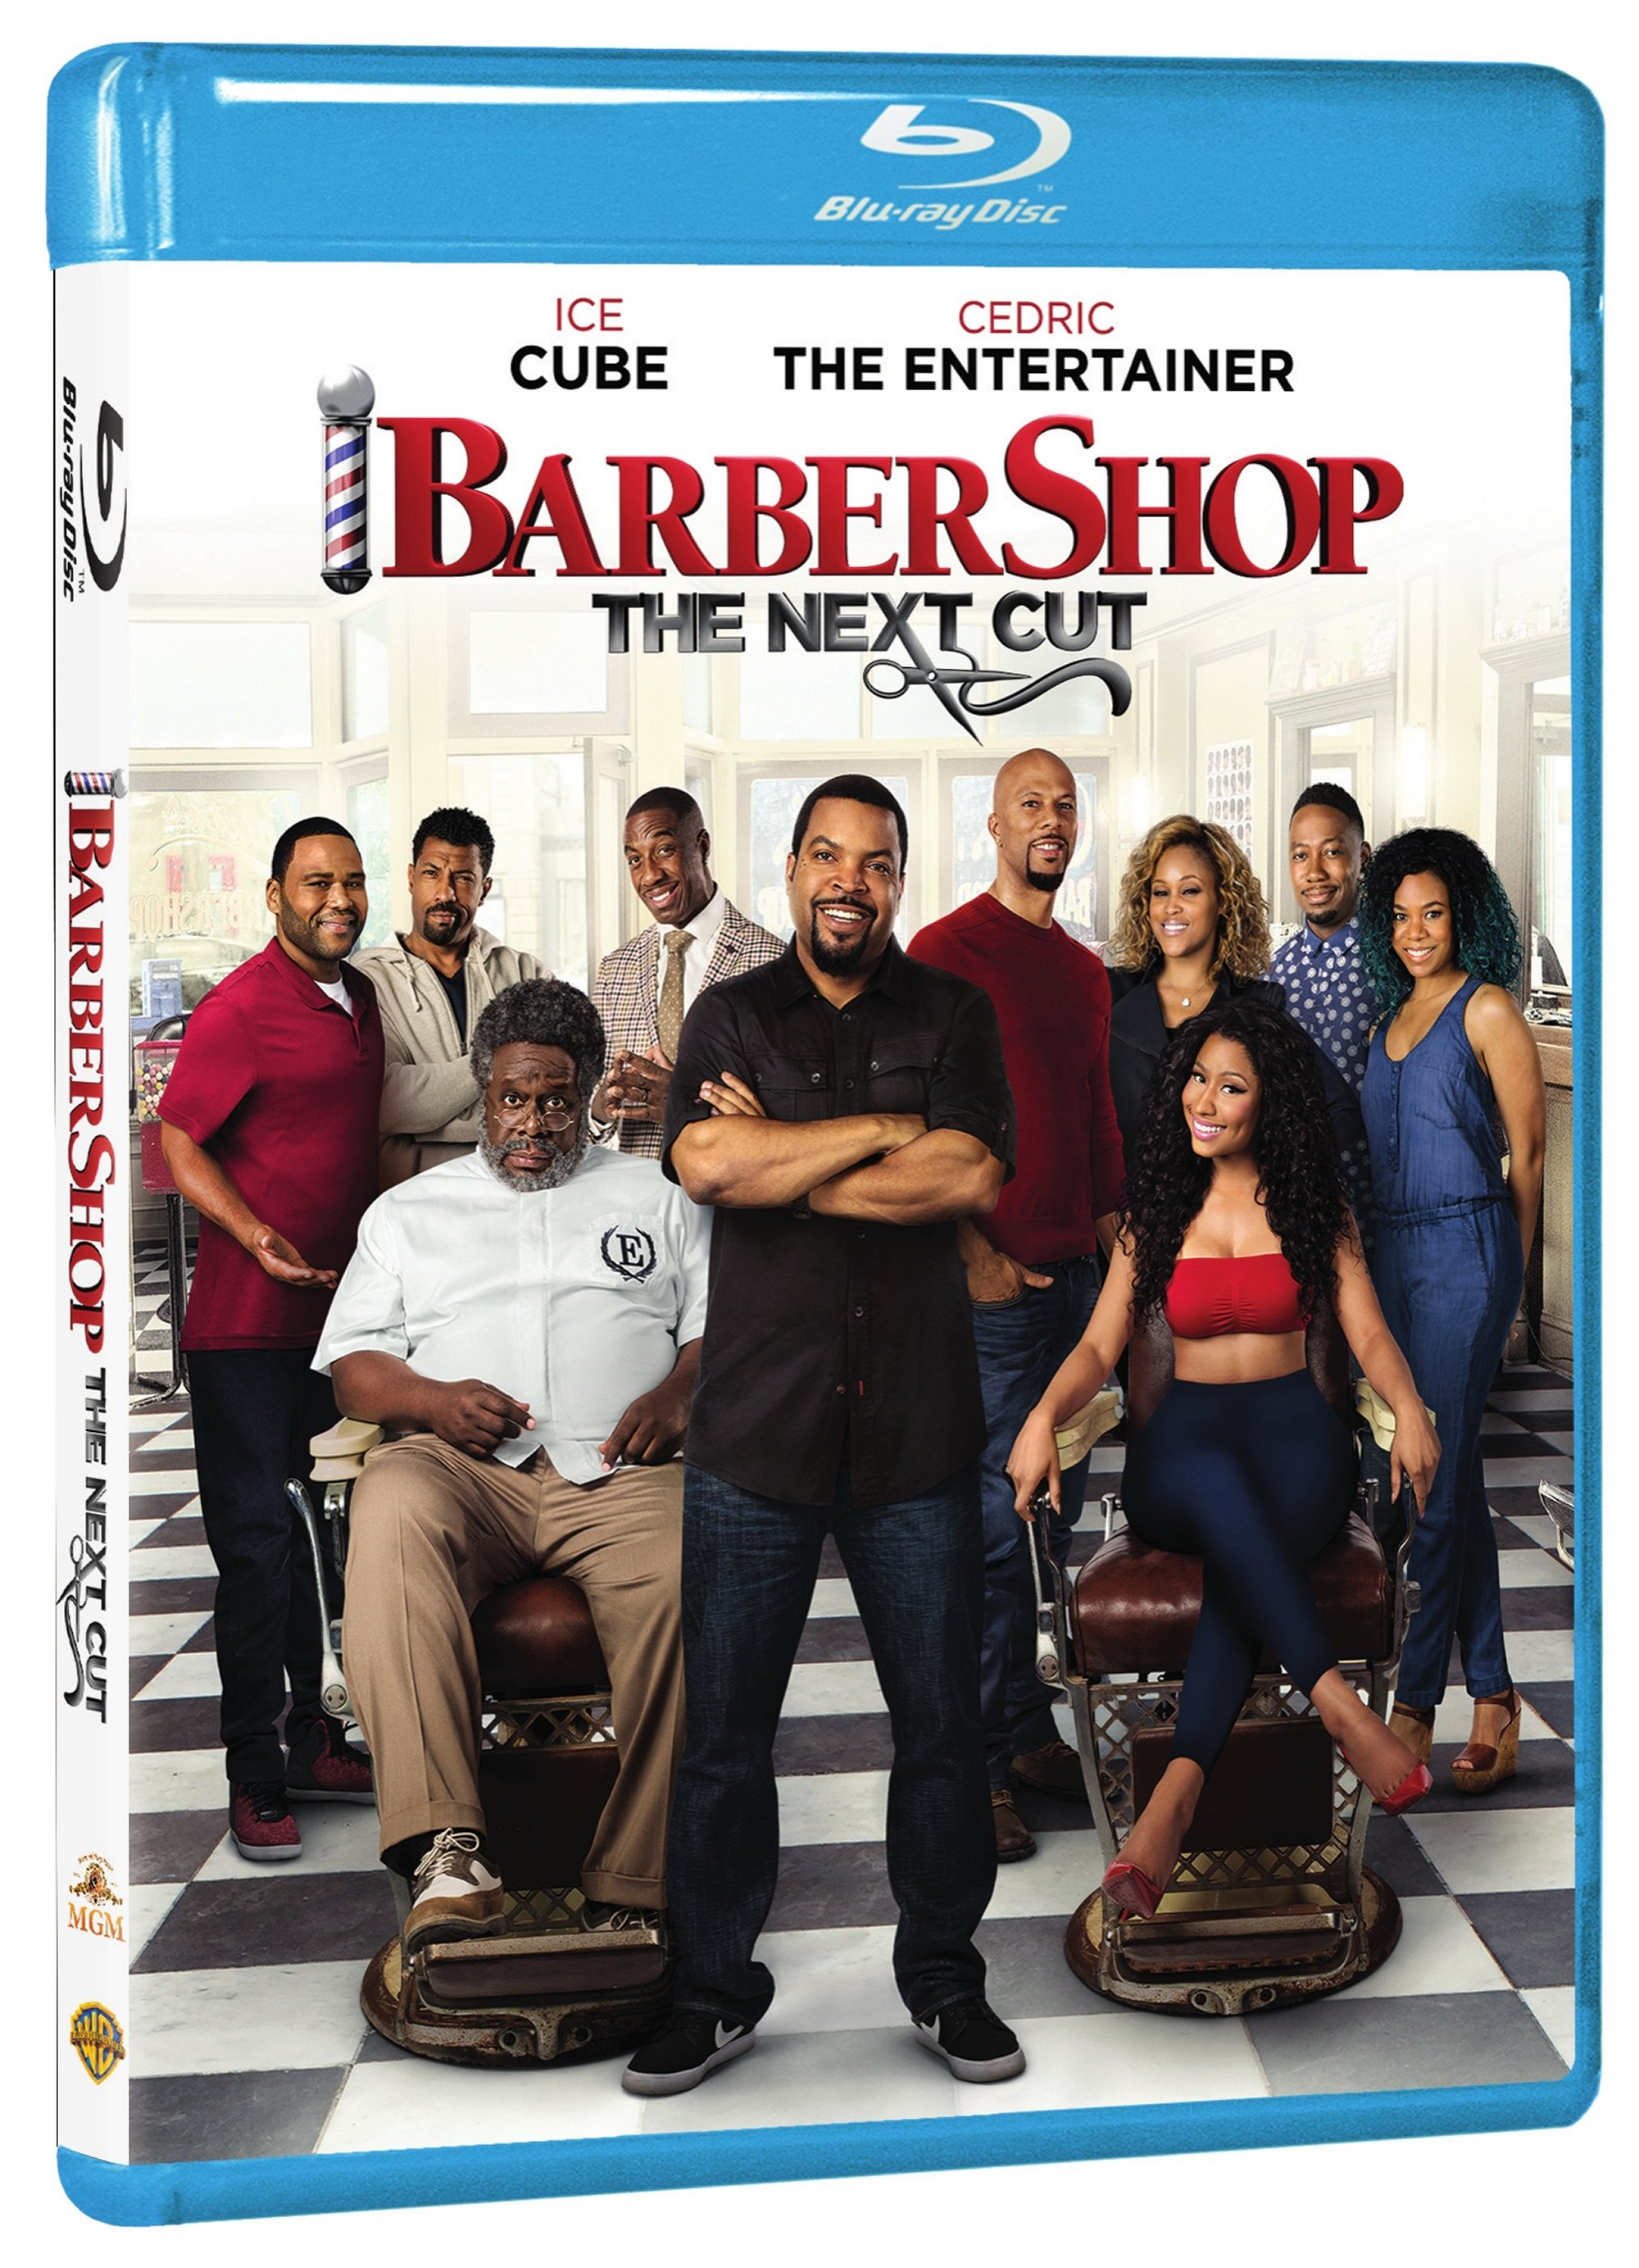 Barbershop_ The Next Cut 3D Box Art